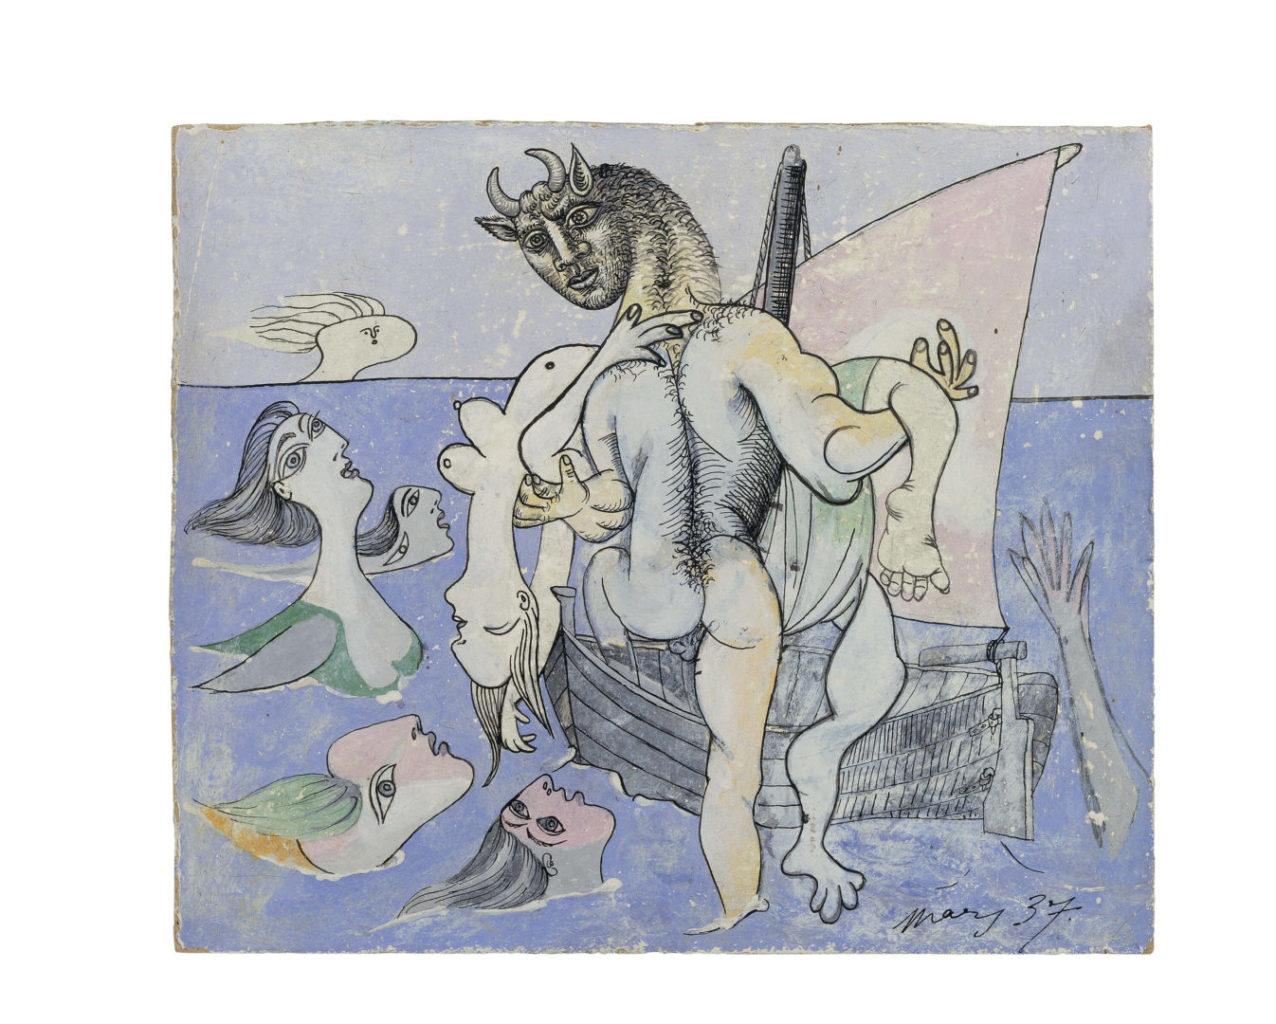 Picasso minotaurs and matadors at the gagosian the london